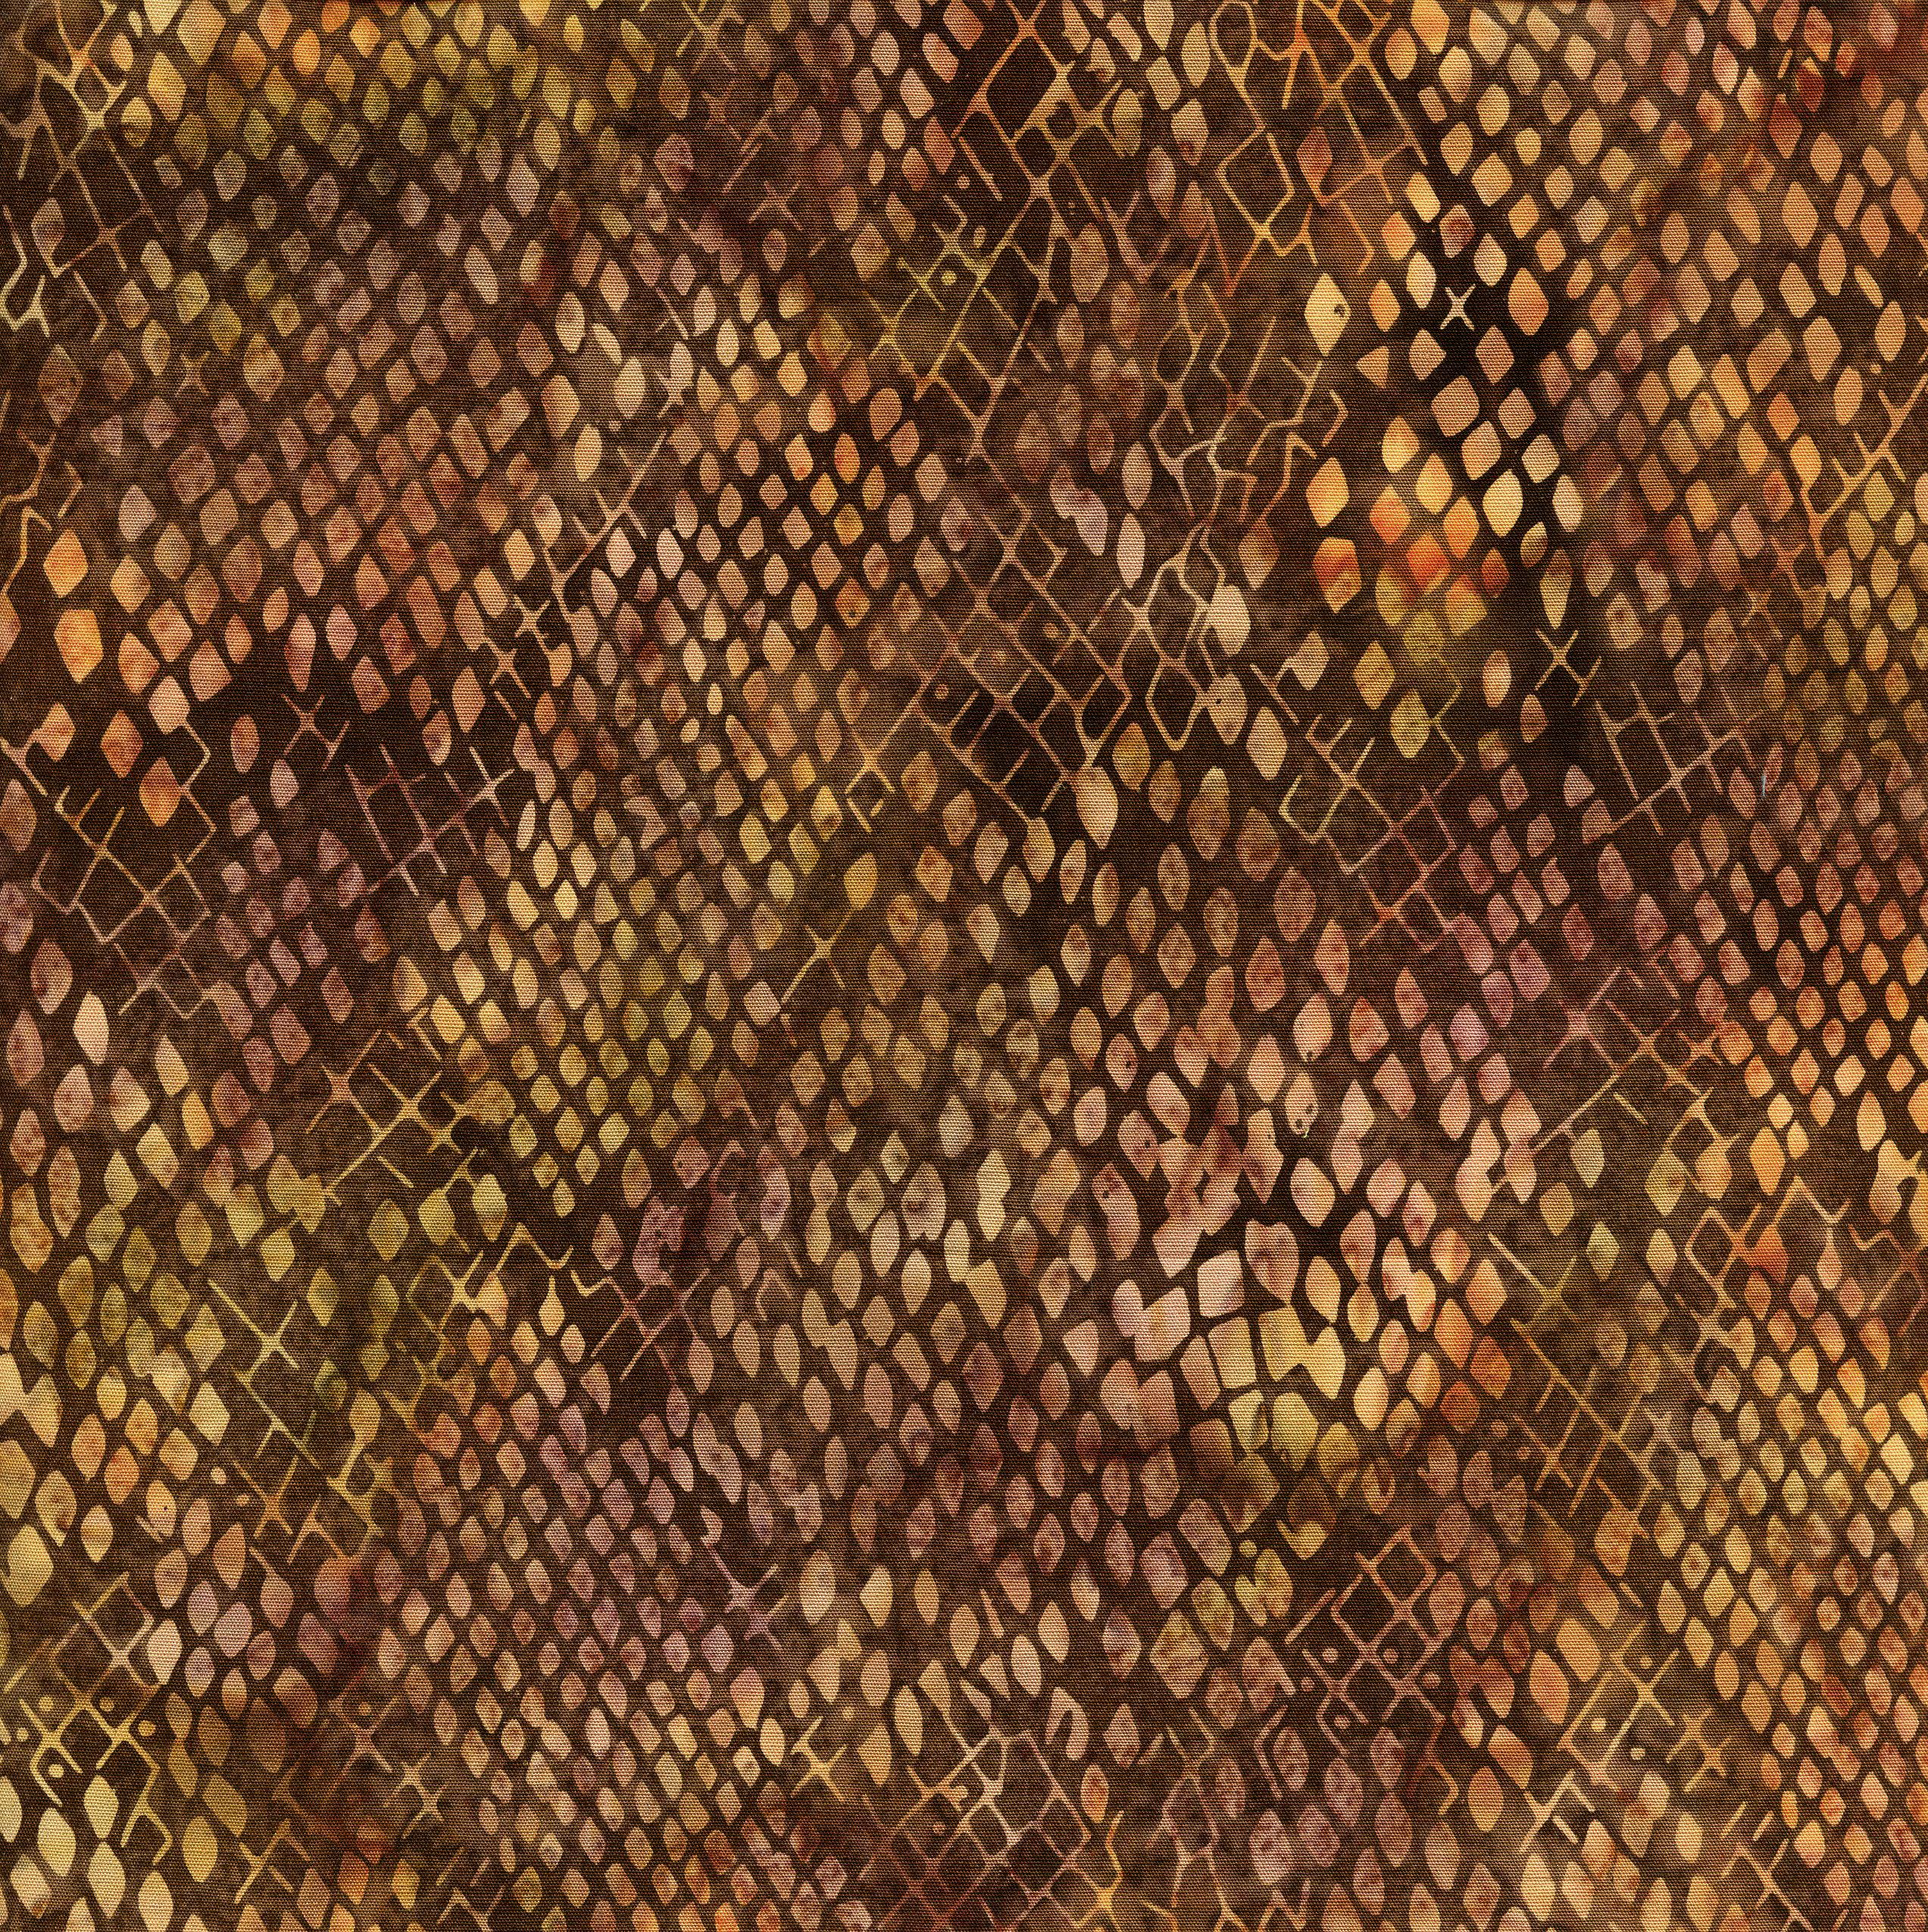 ISLAND BATIK111805845 / Snake Skin-Dusk